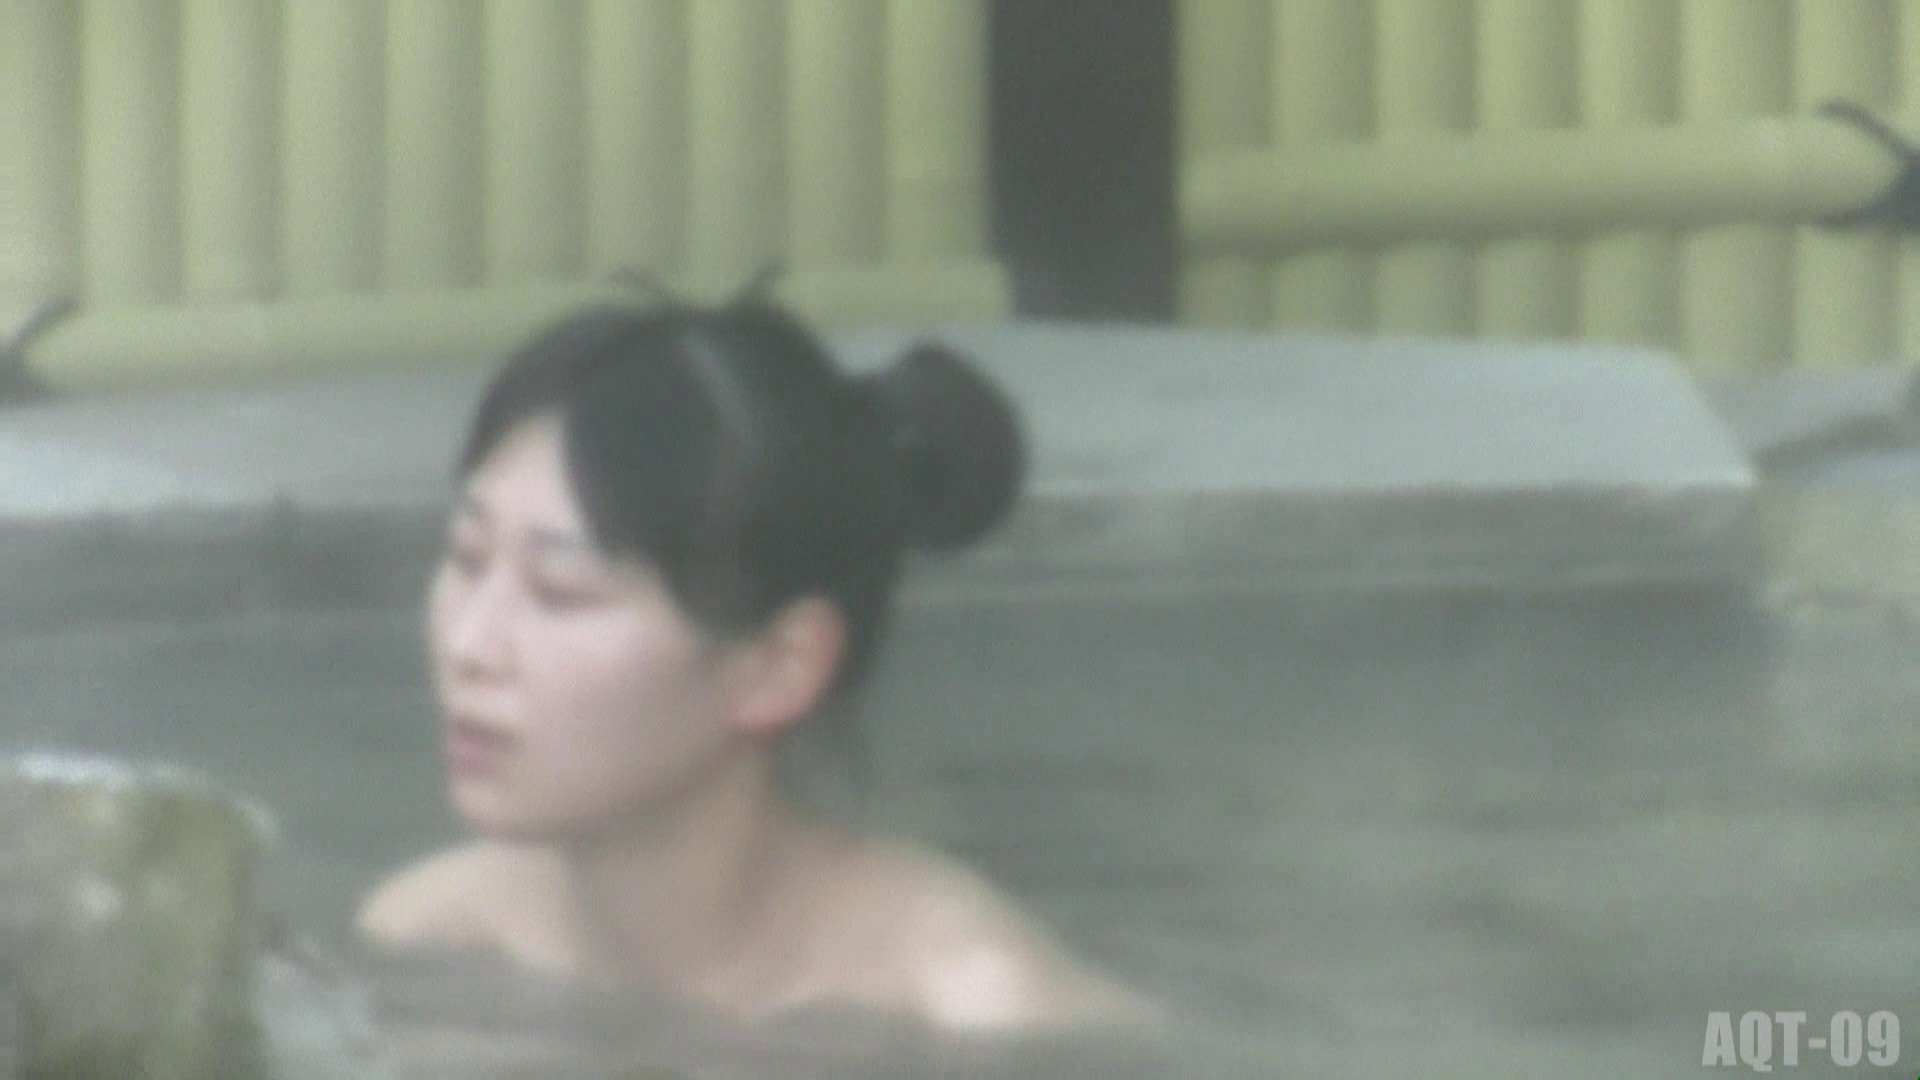 Aquaな露天風呂Vol.785 露天風呂編  110PIX 44